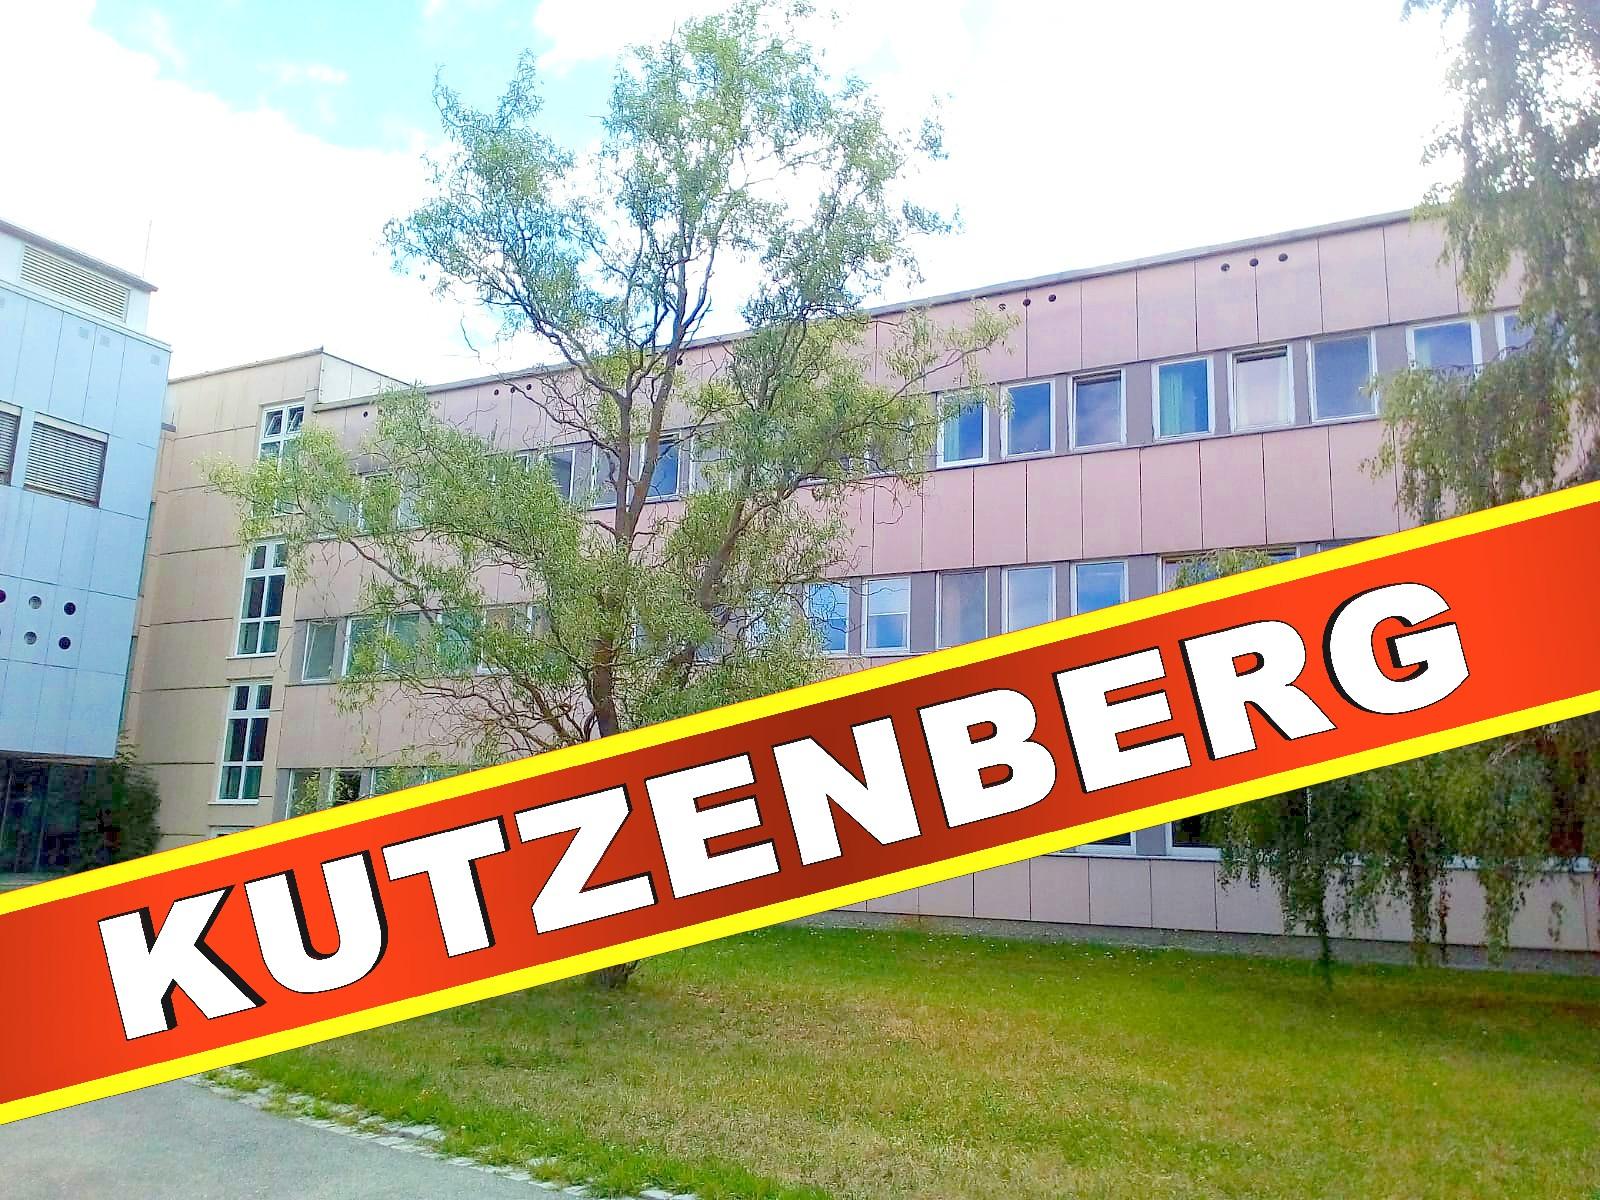 Bezirksklinikum Obermain Kutzenberg, 96250 Ebensfeld Psychiatrie Polizei Krankenhaus (42)